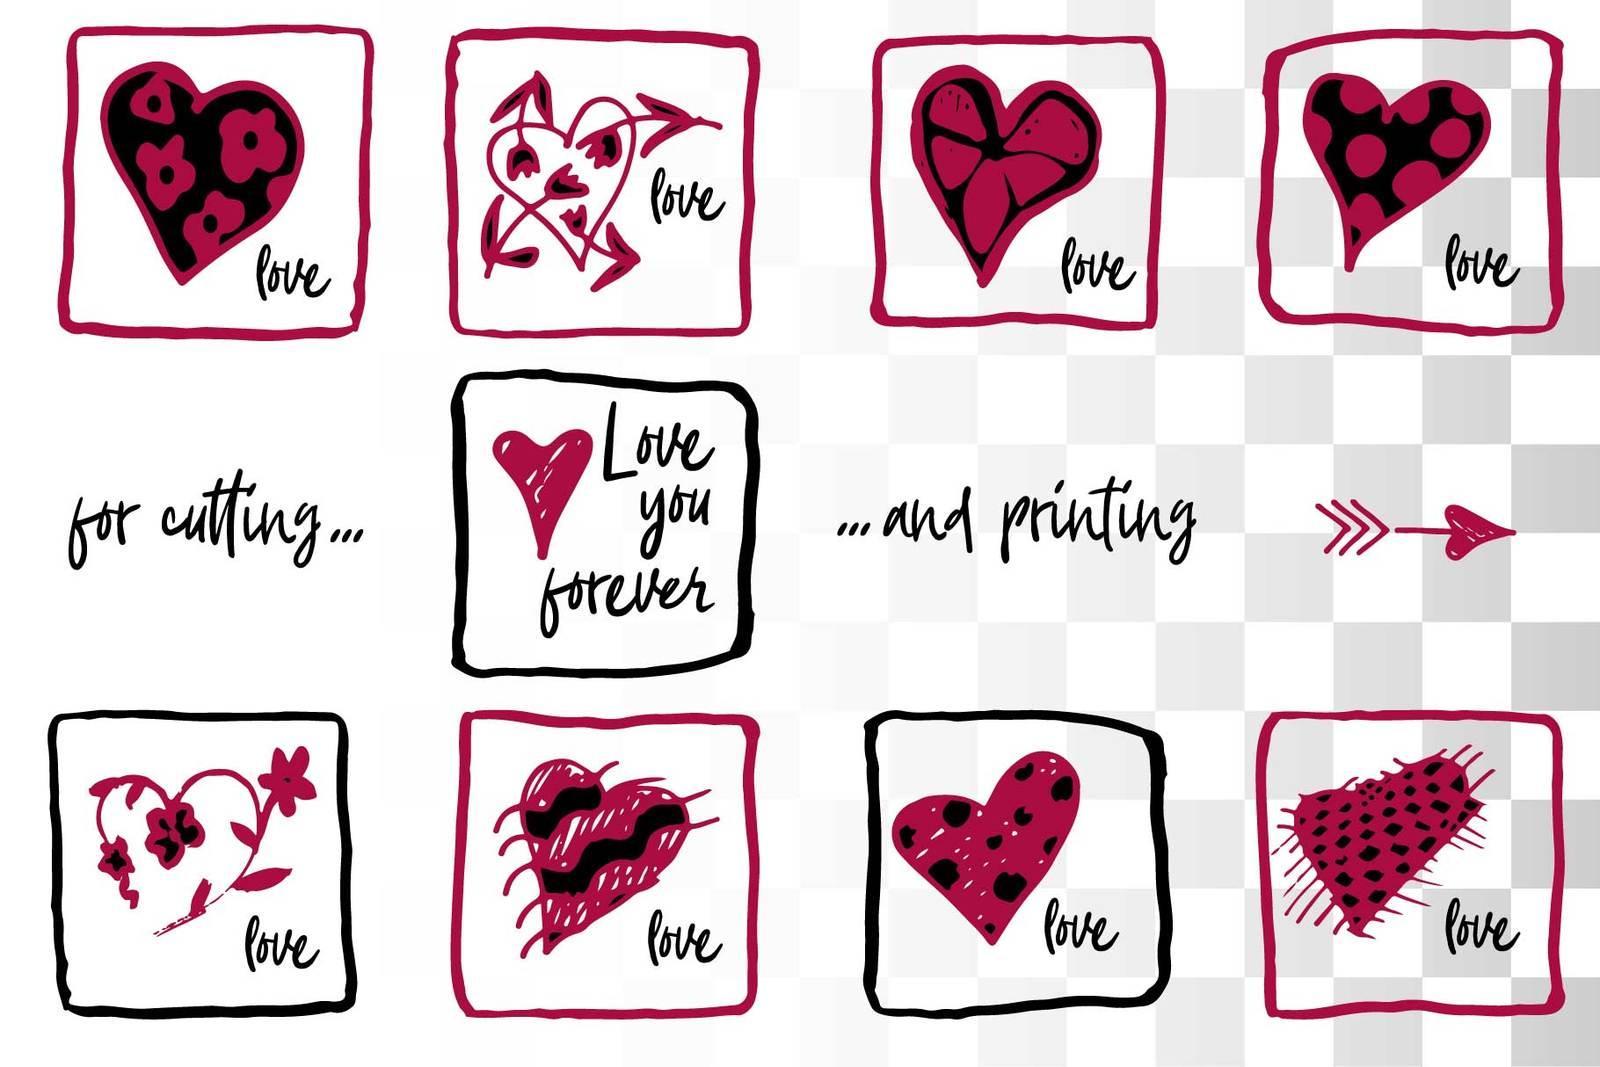 Lovely valentines day set - #2 SVG